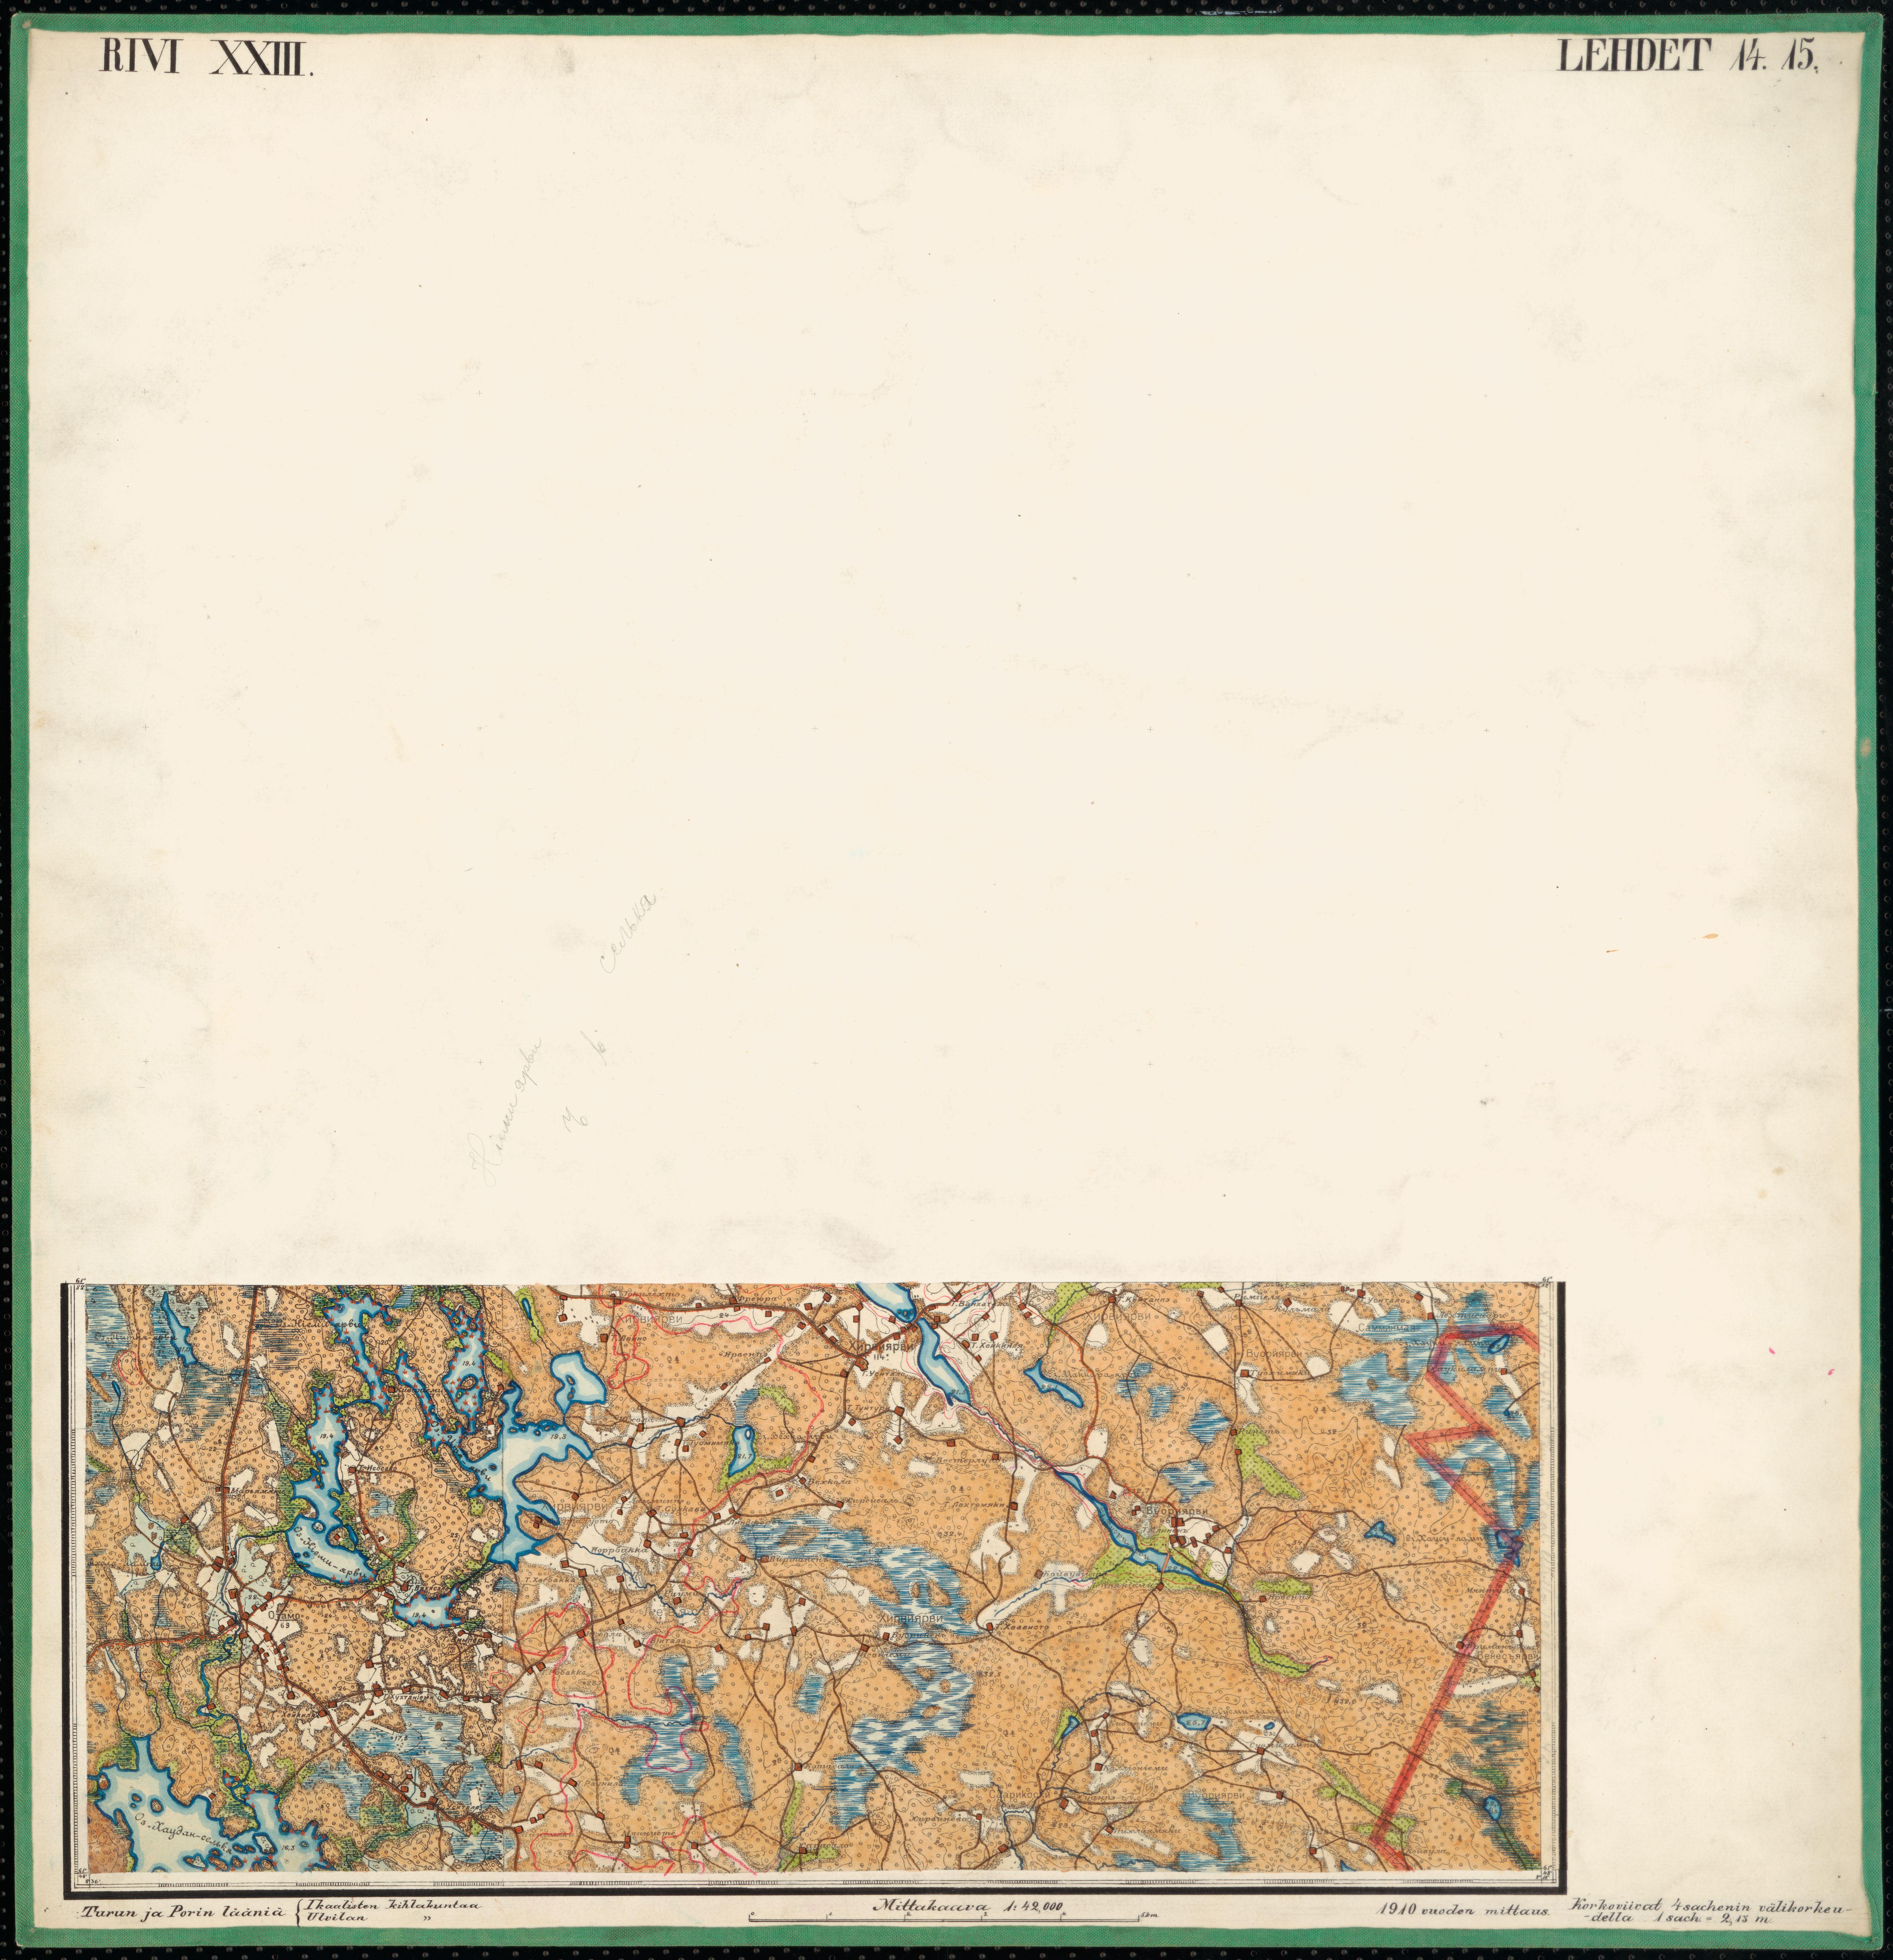 File Senate Atlas 1870 1907 Sheet Xxiii Xxiv 14 15 Siikainen Jpg